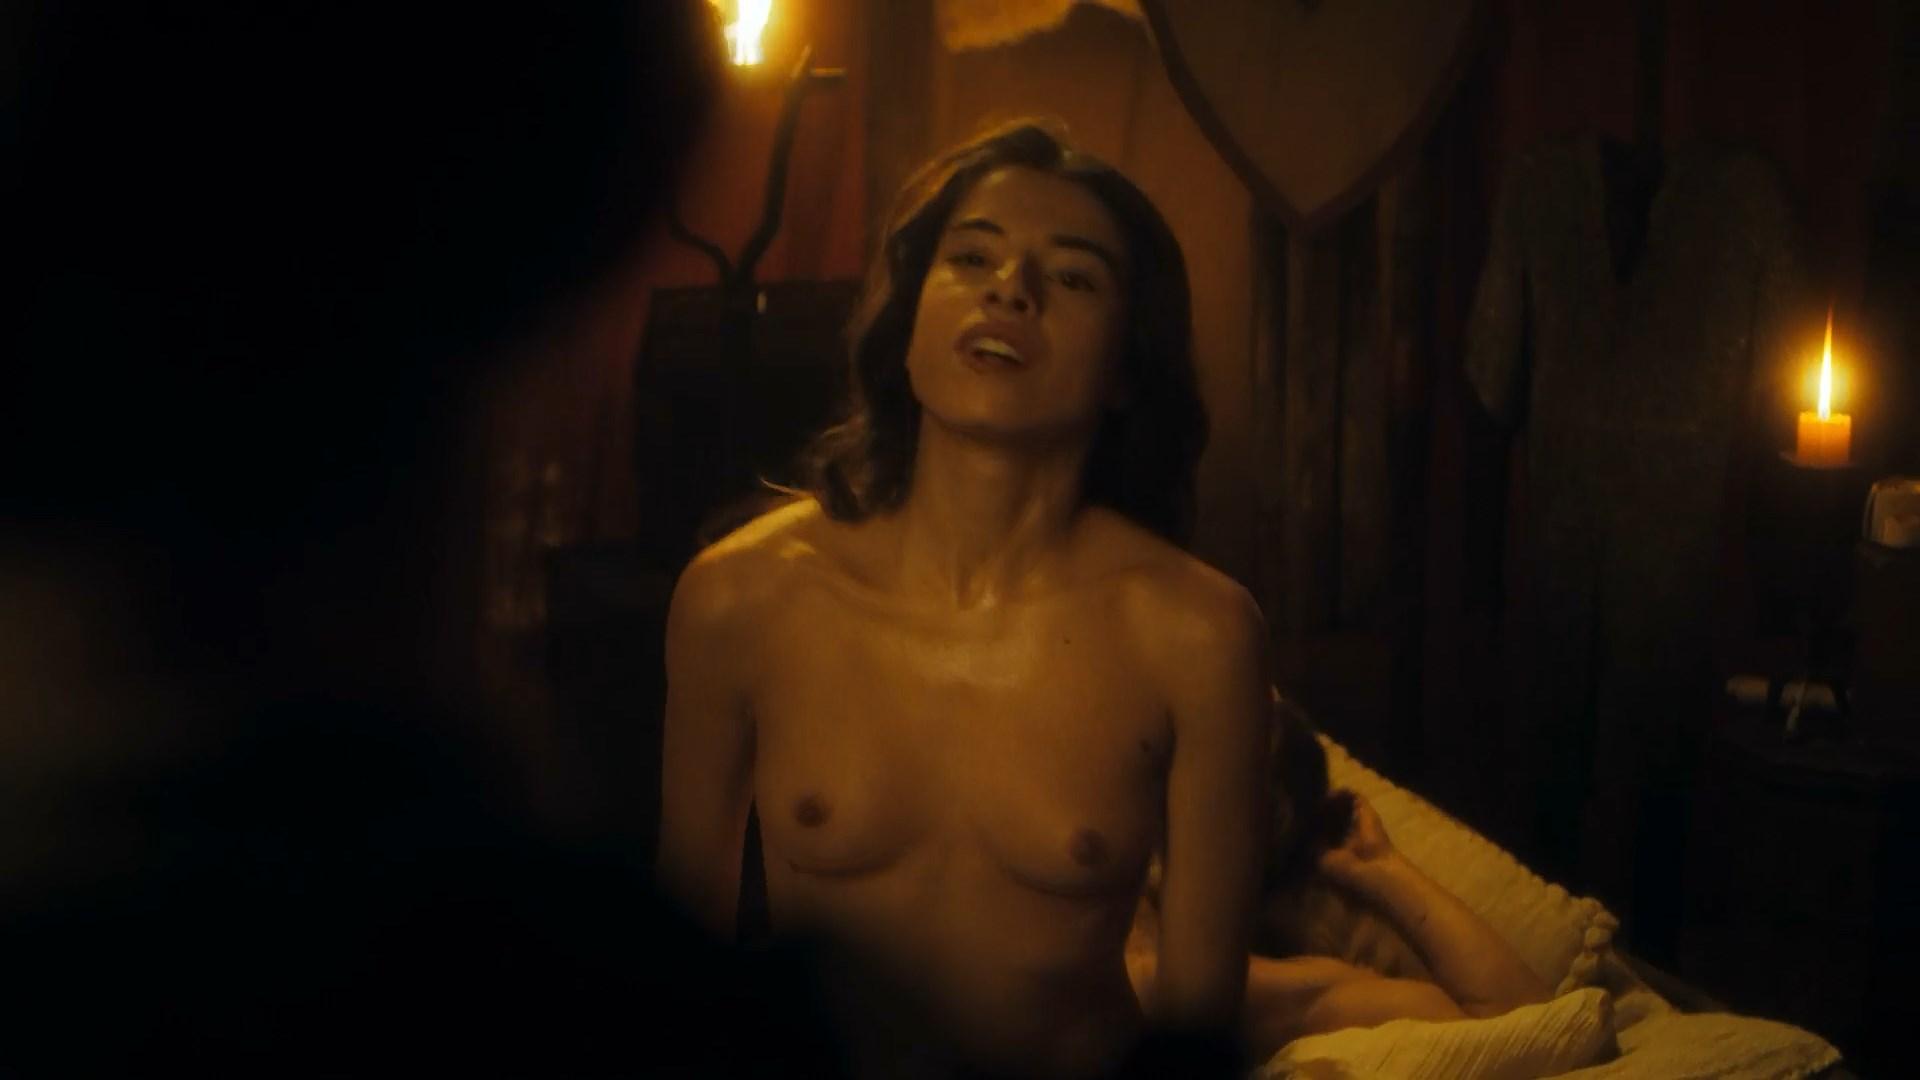 Oblivion sex video adult